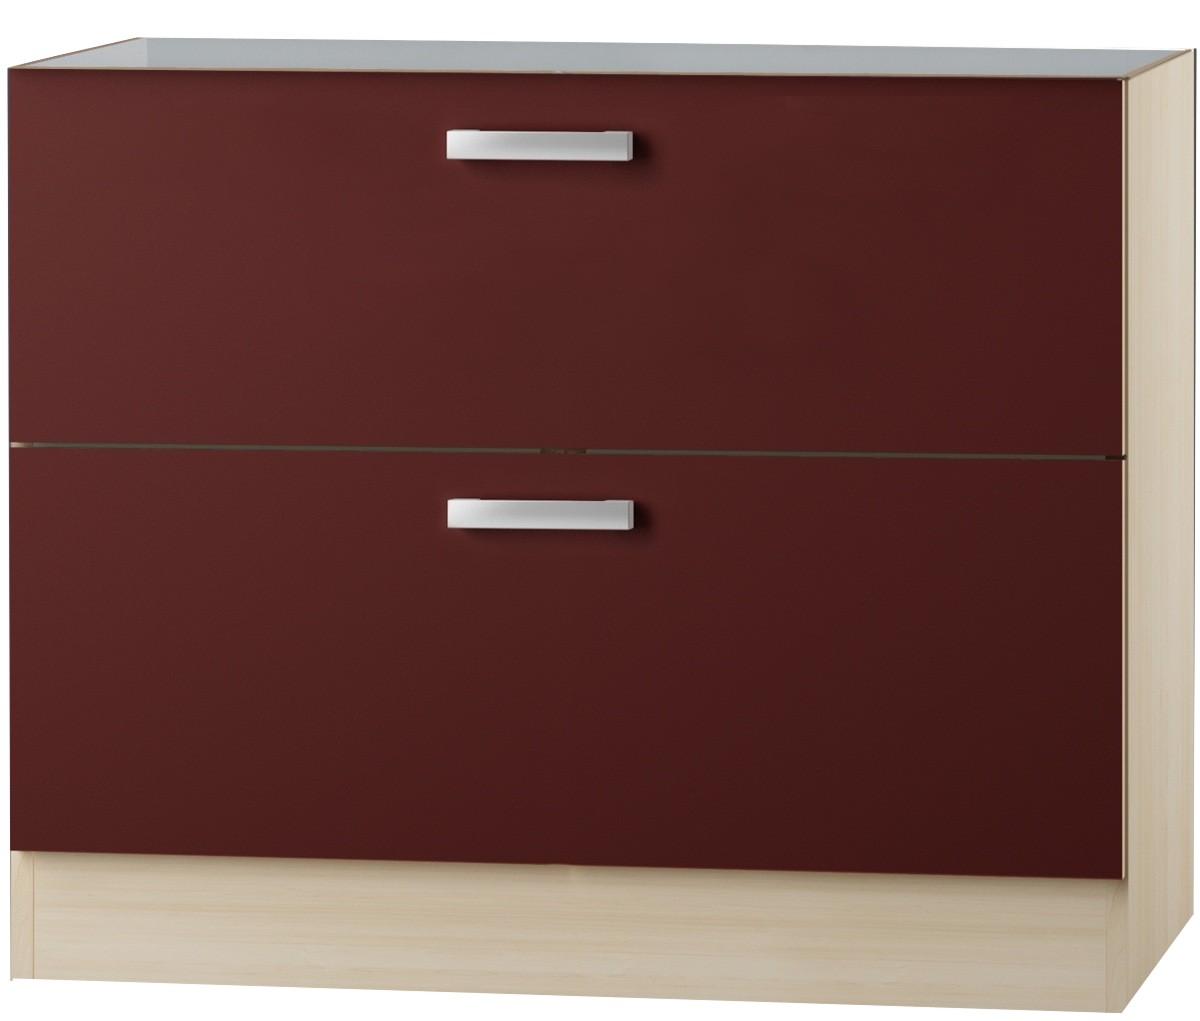 kult bergamo unterschrank 100 cm breit bordeaux rot uo126 ebay. Black Bedroom Furniture Sets. Home Design Ideas